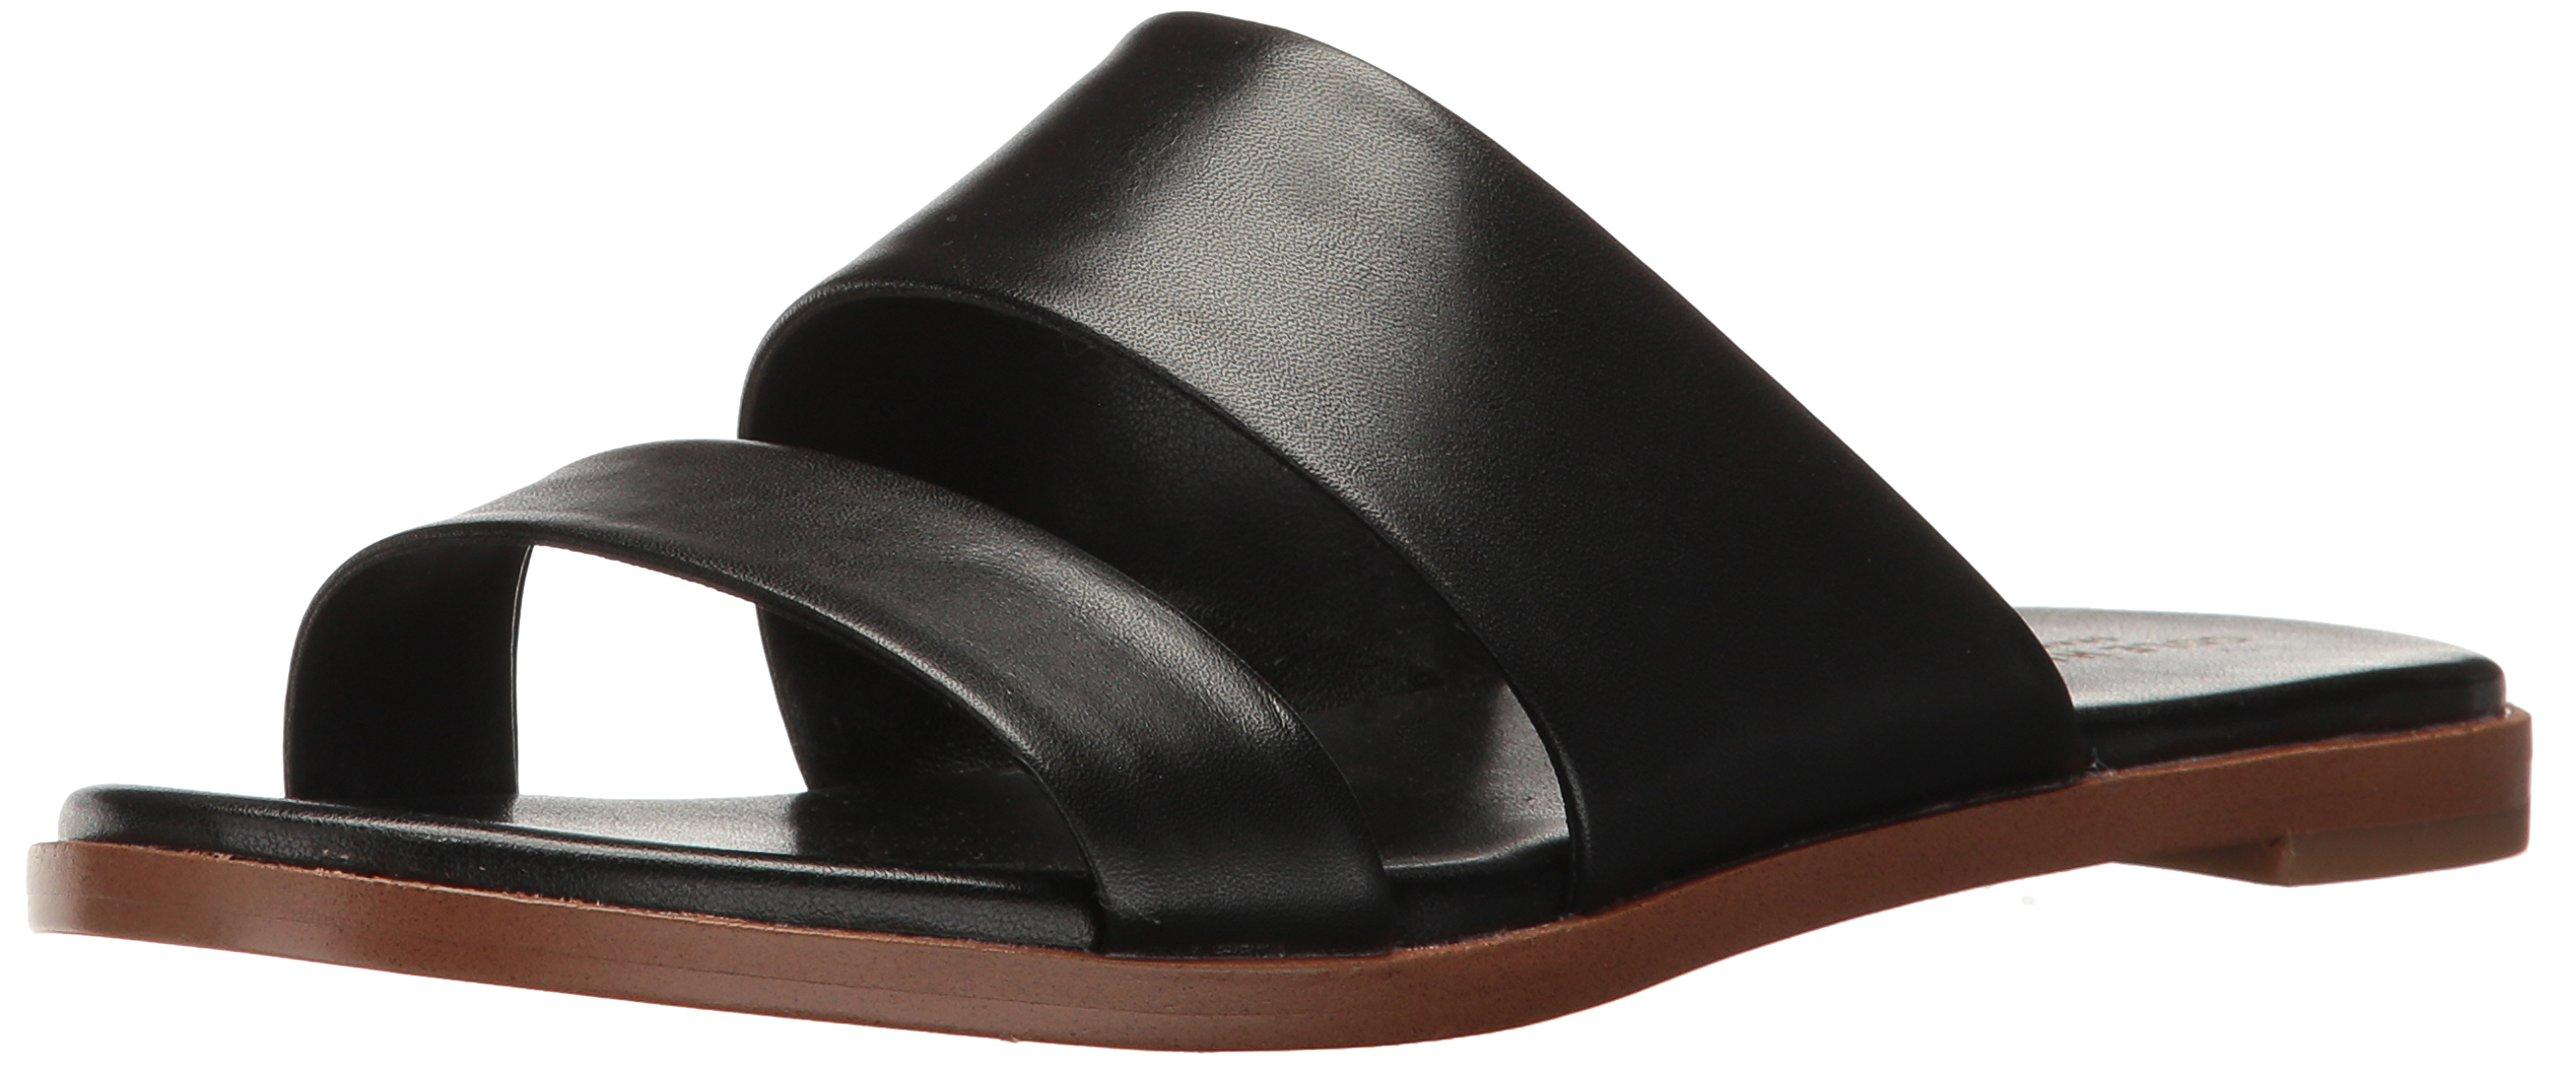 Cole Haan Women's Anica Slide Sandal, Black, 9.5 B US